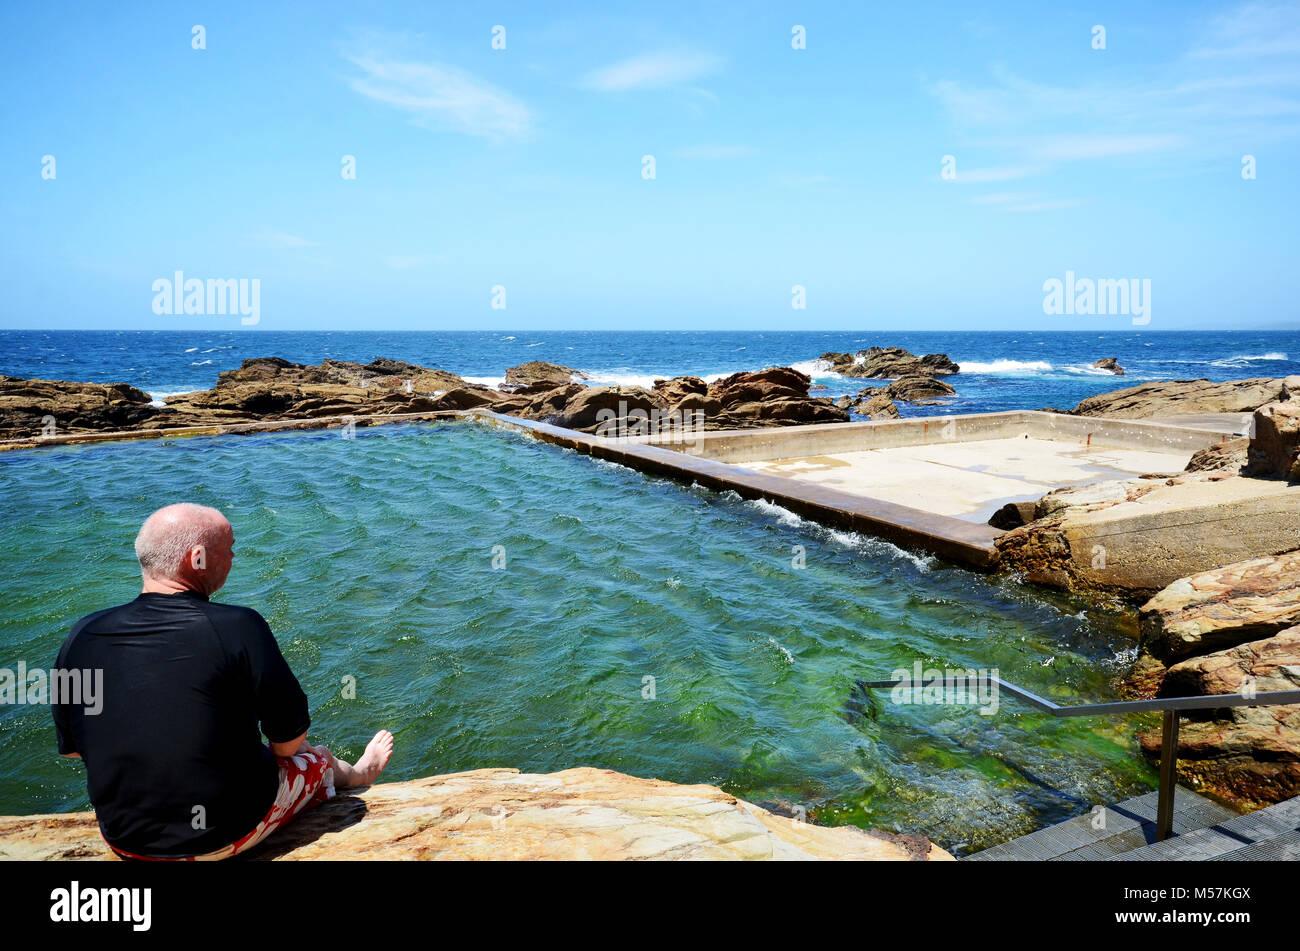 Man sitting on edge of pool at the Blue Pool Bermagui NSW Australia - Stock Image